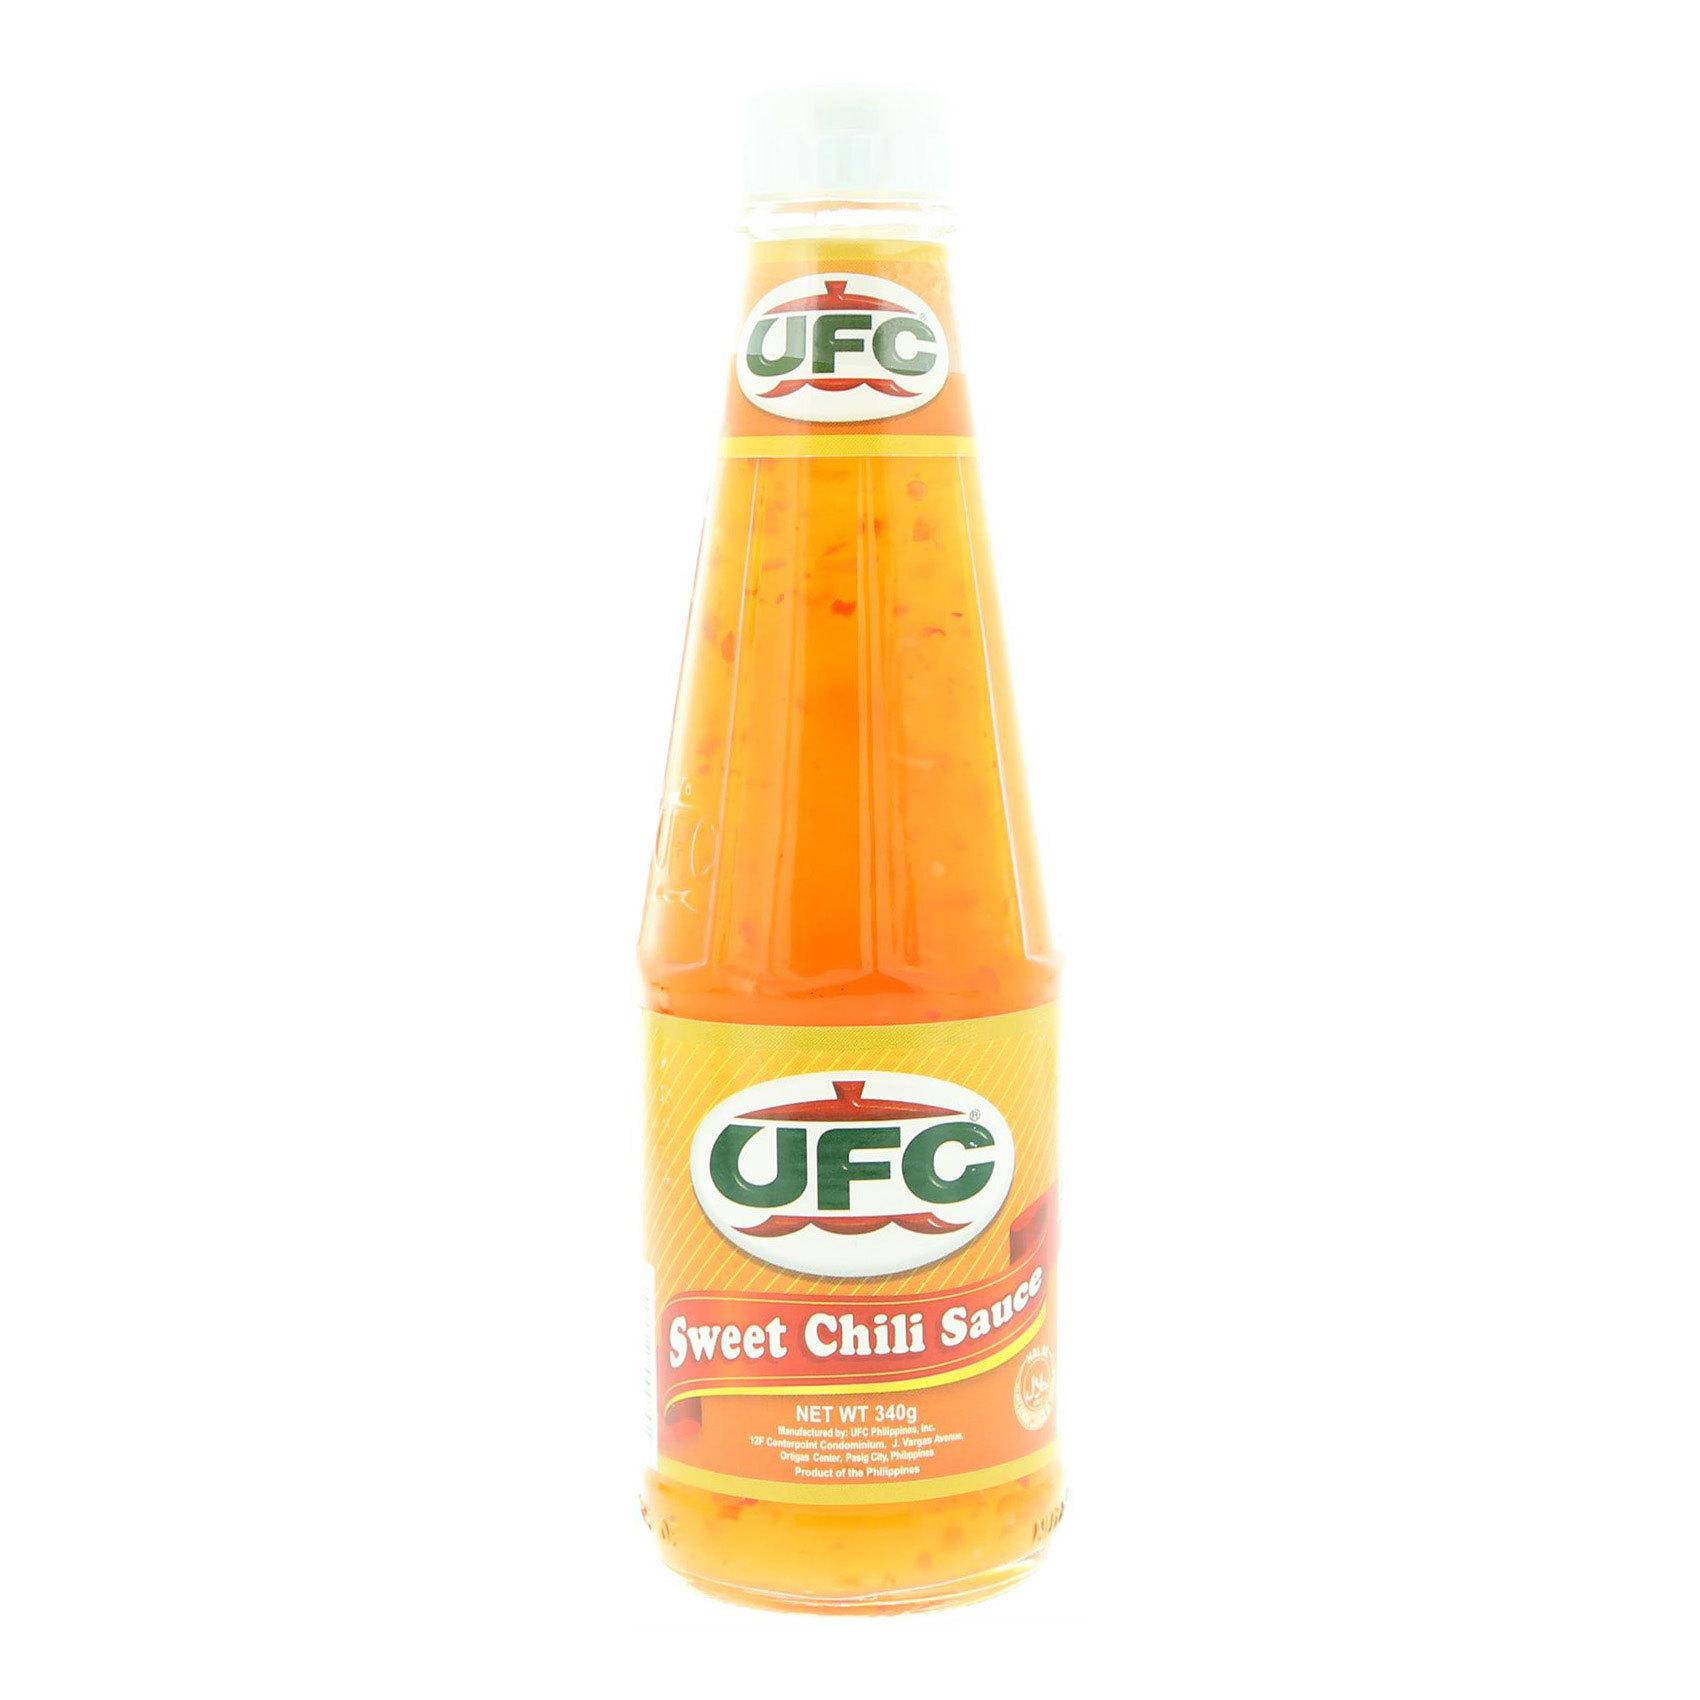 UFC SWEET CHILLI SAUCE 340G